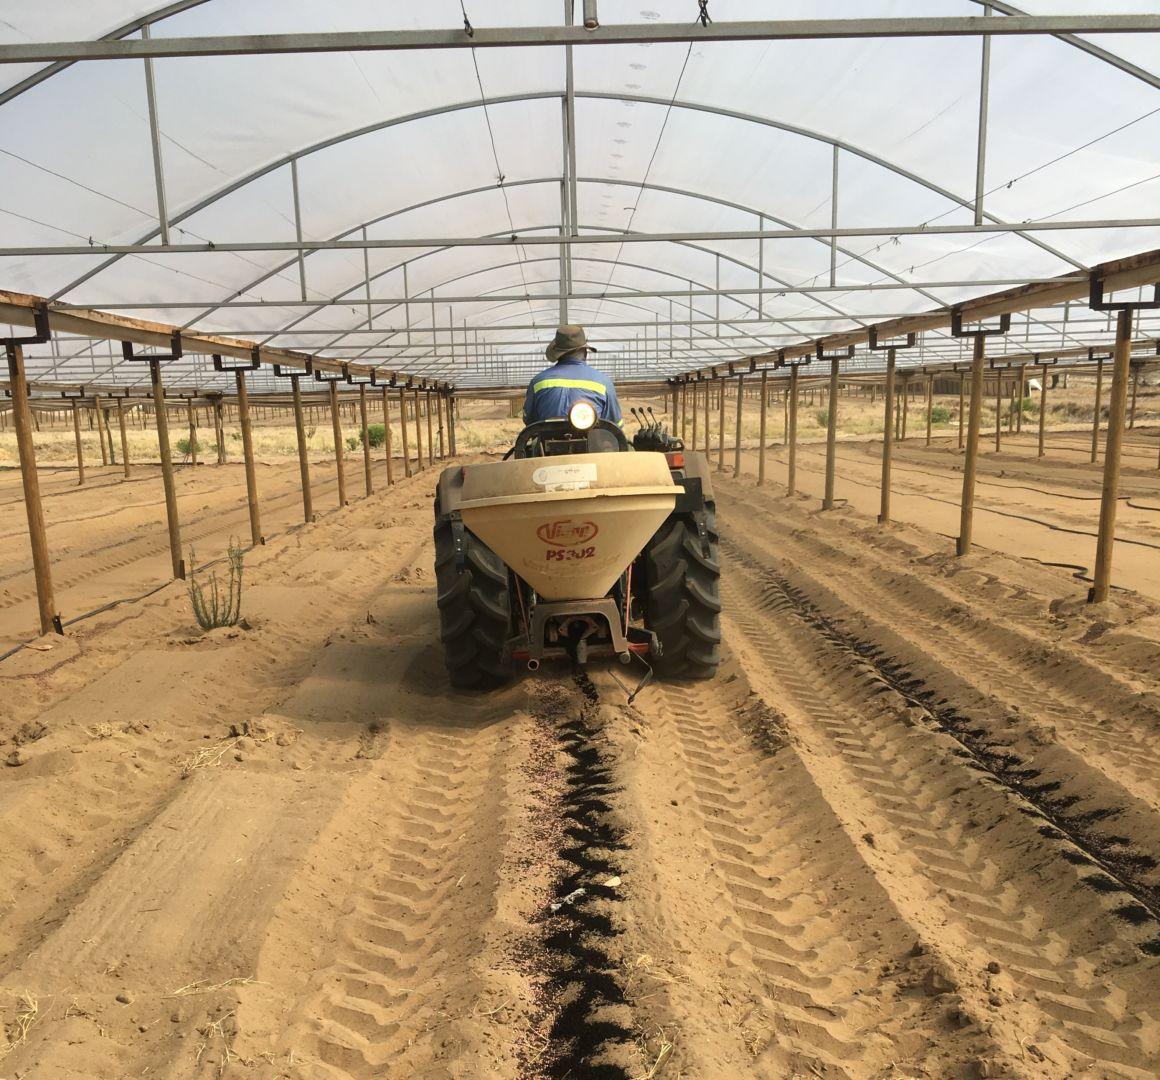 Spreading biochar under a greenhouse using a mechanical spreader